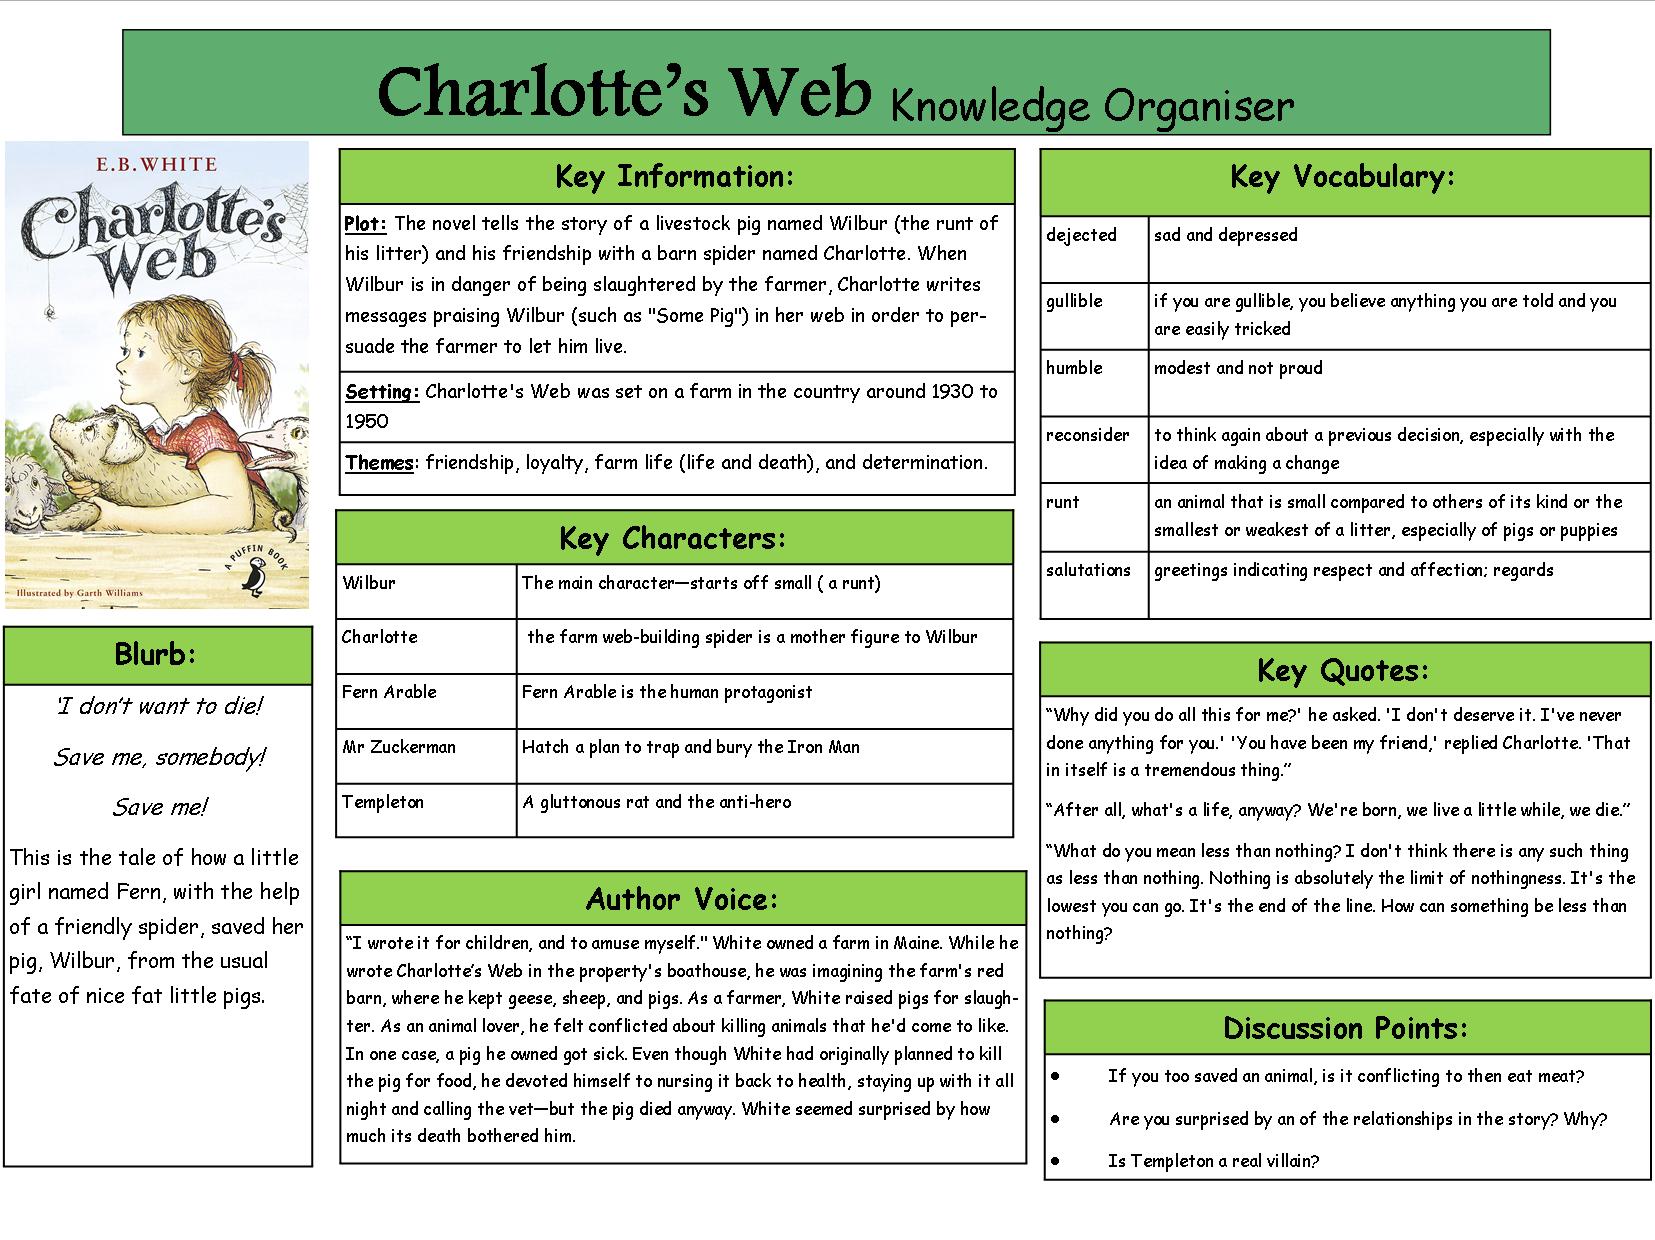 Charlotte's Web Knowledge Organiser